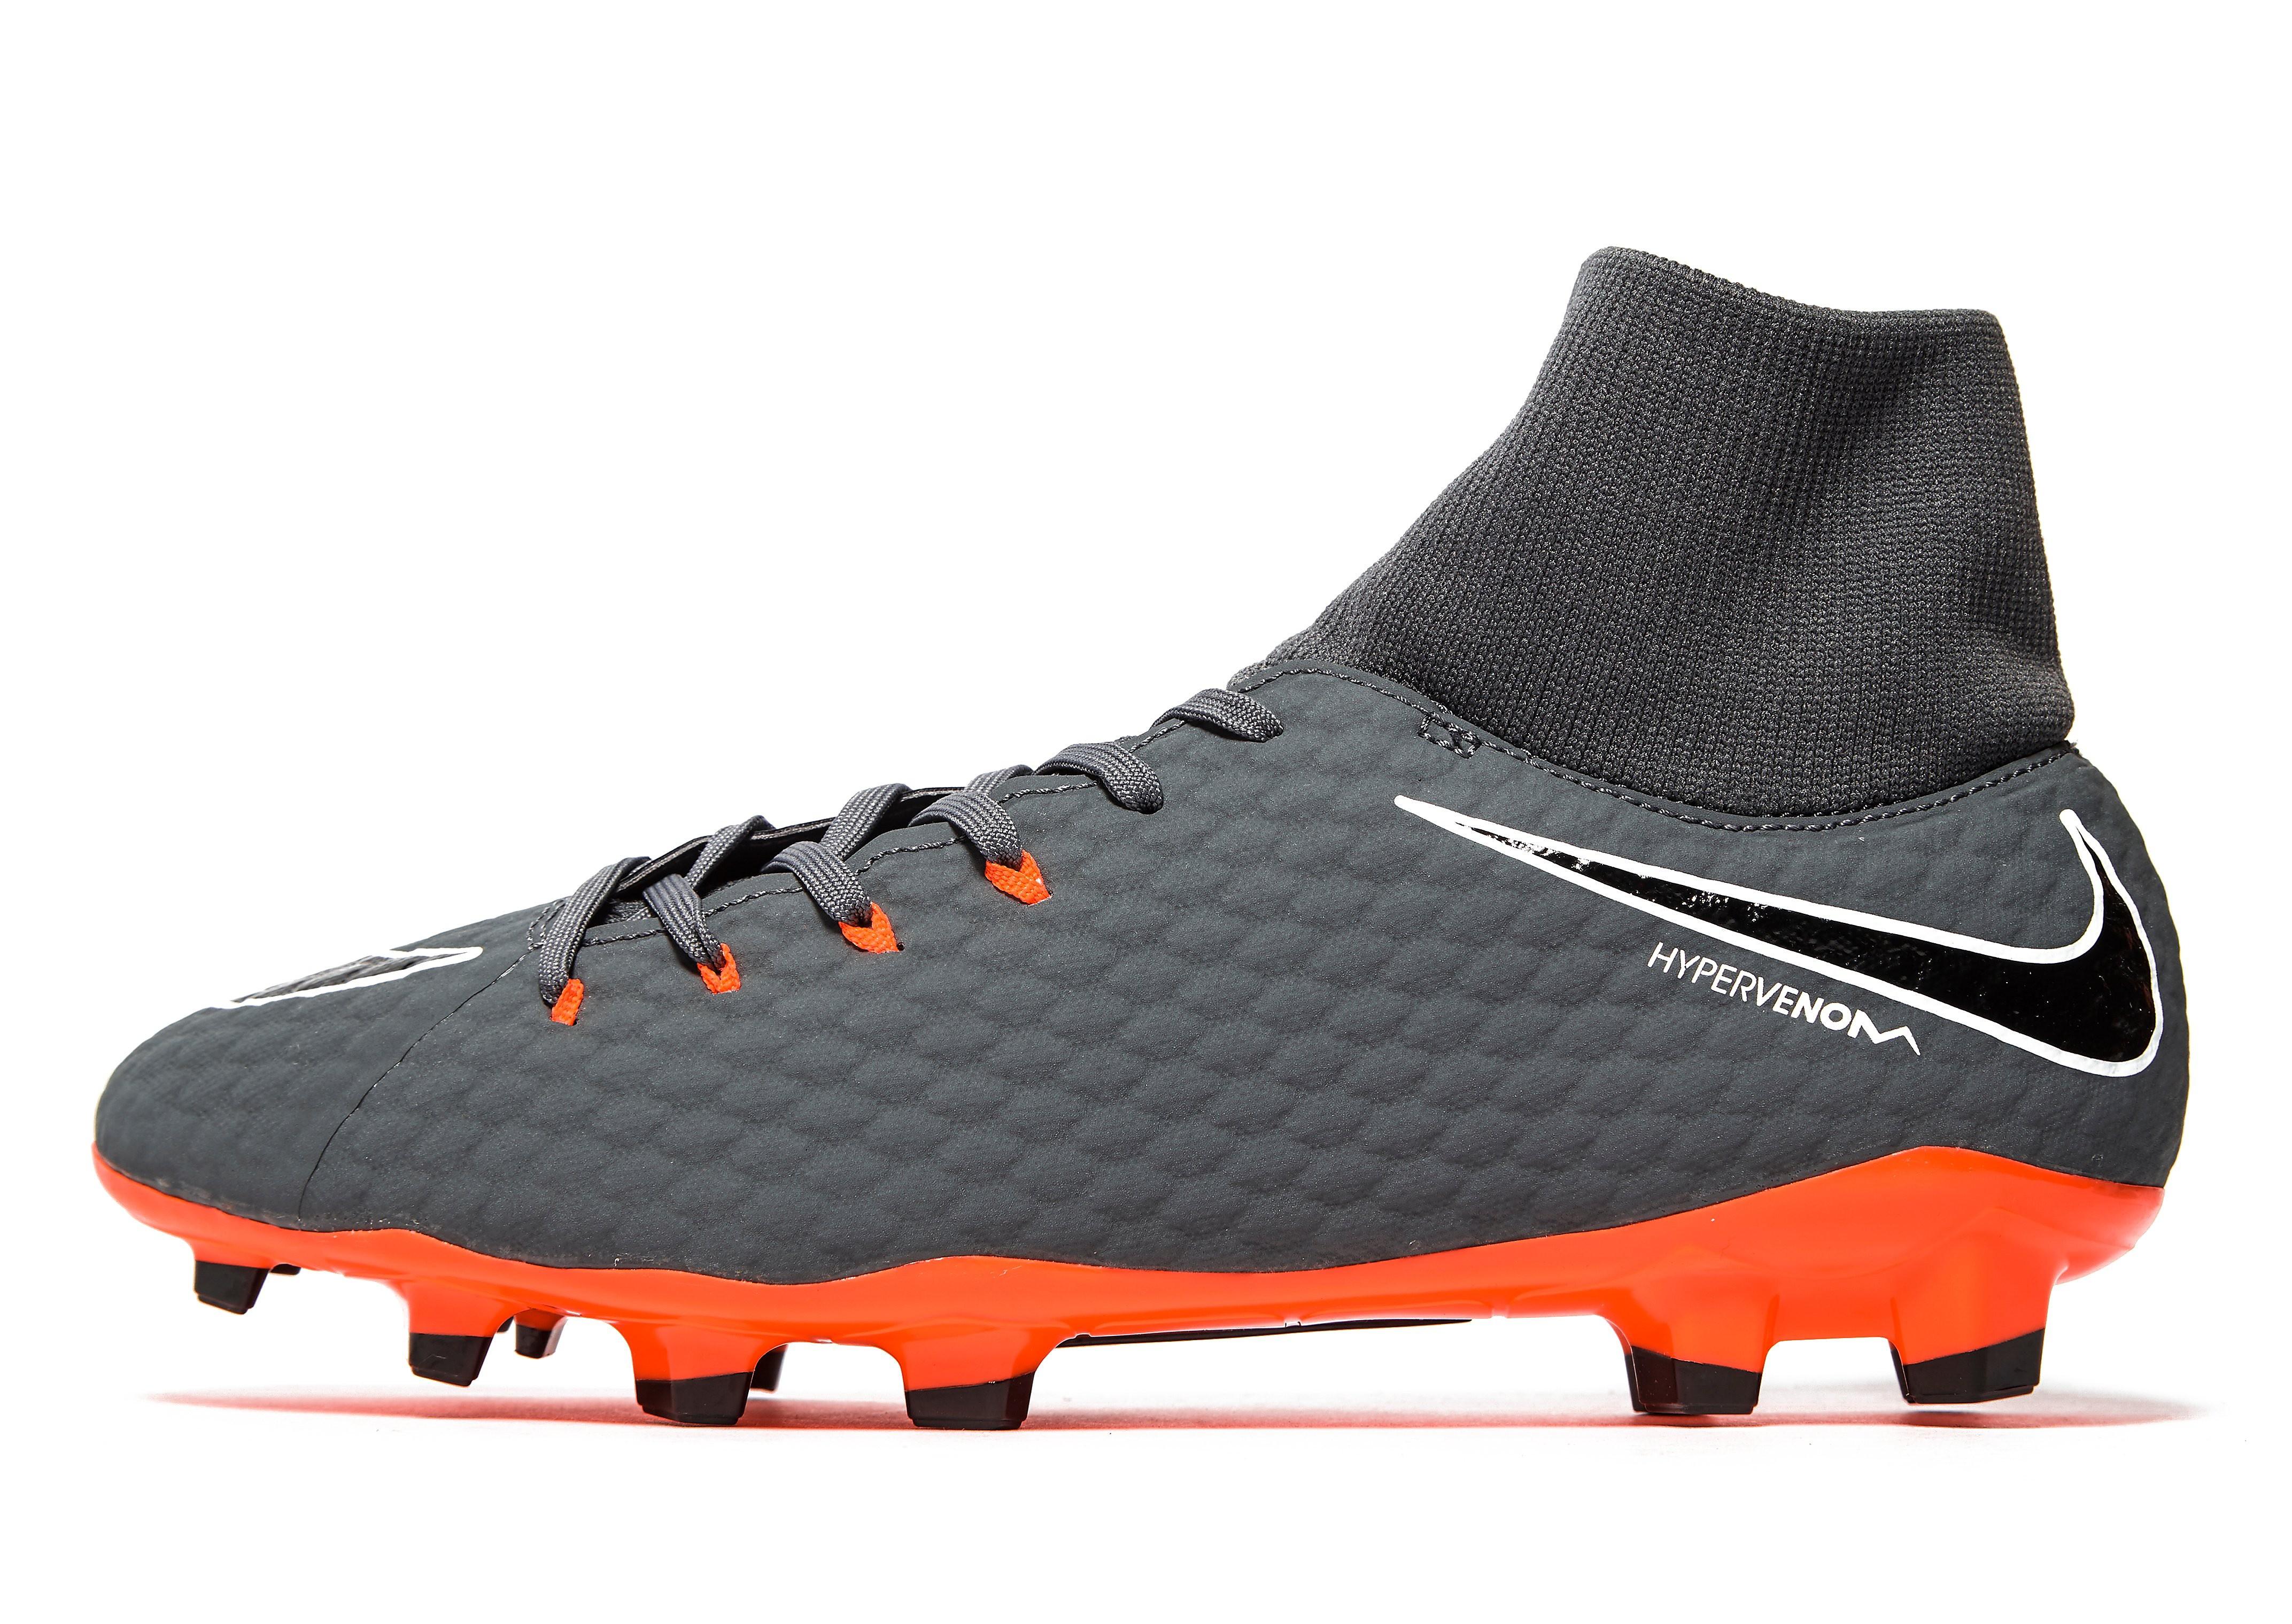 Nike Fast AF Hypervenom Academy Dynamic Fit FG Homme